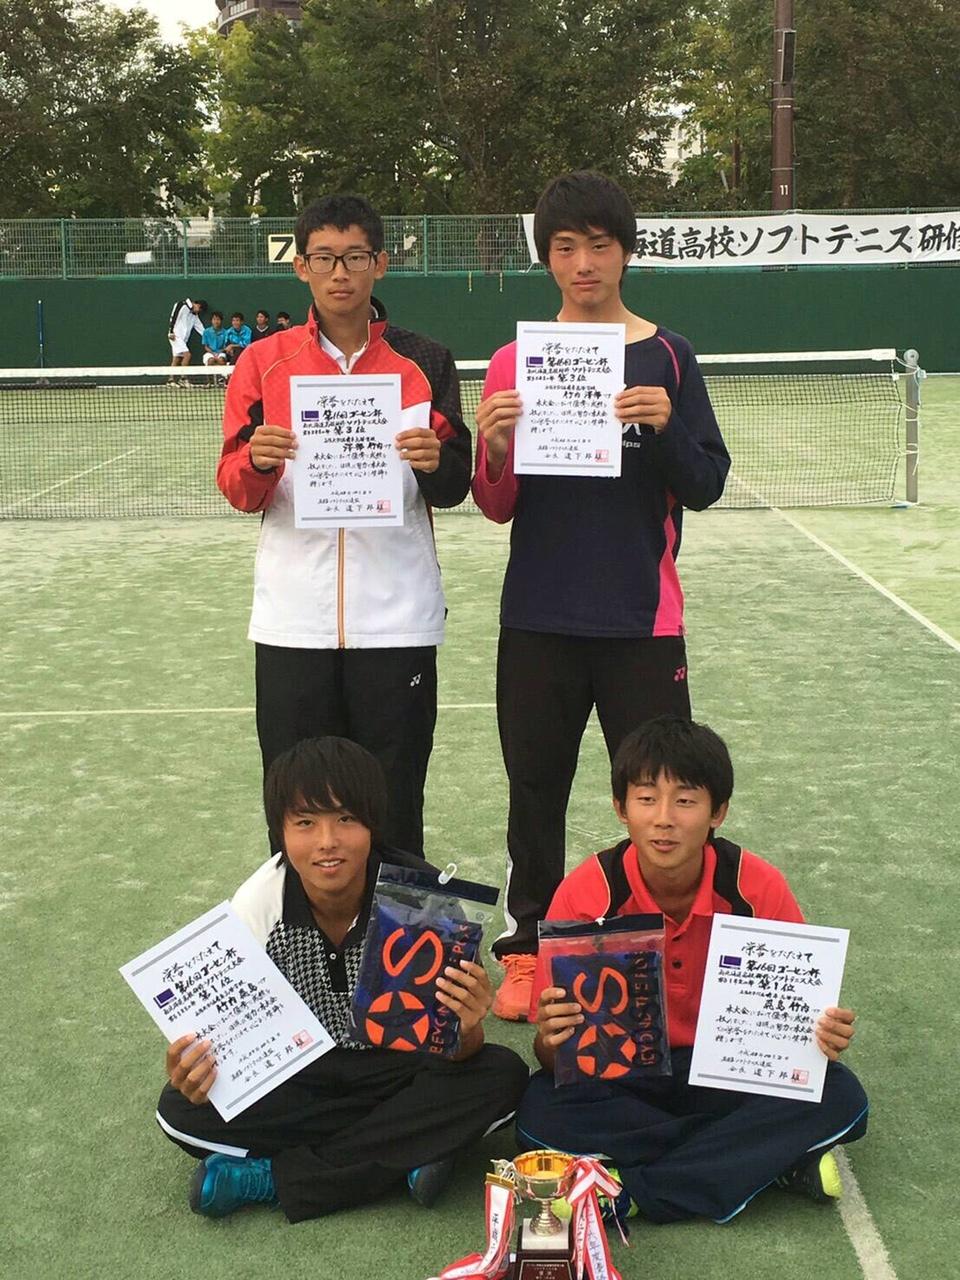 2016 soft-tenis gosen